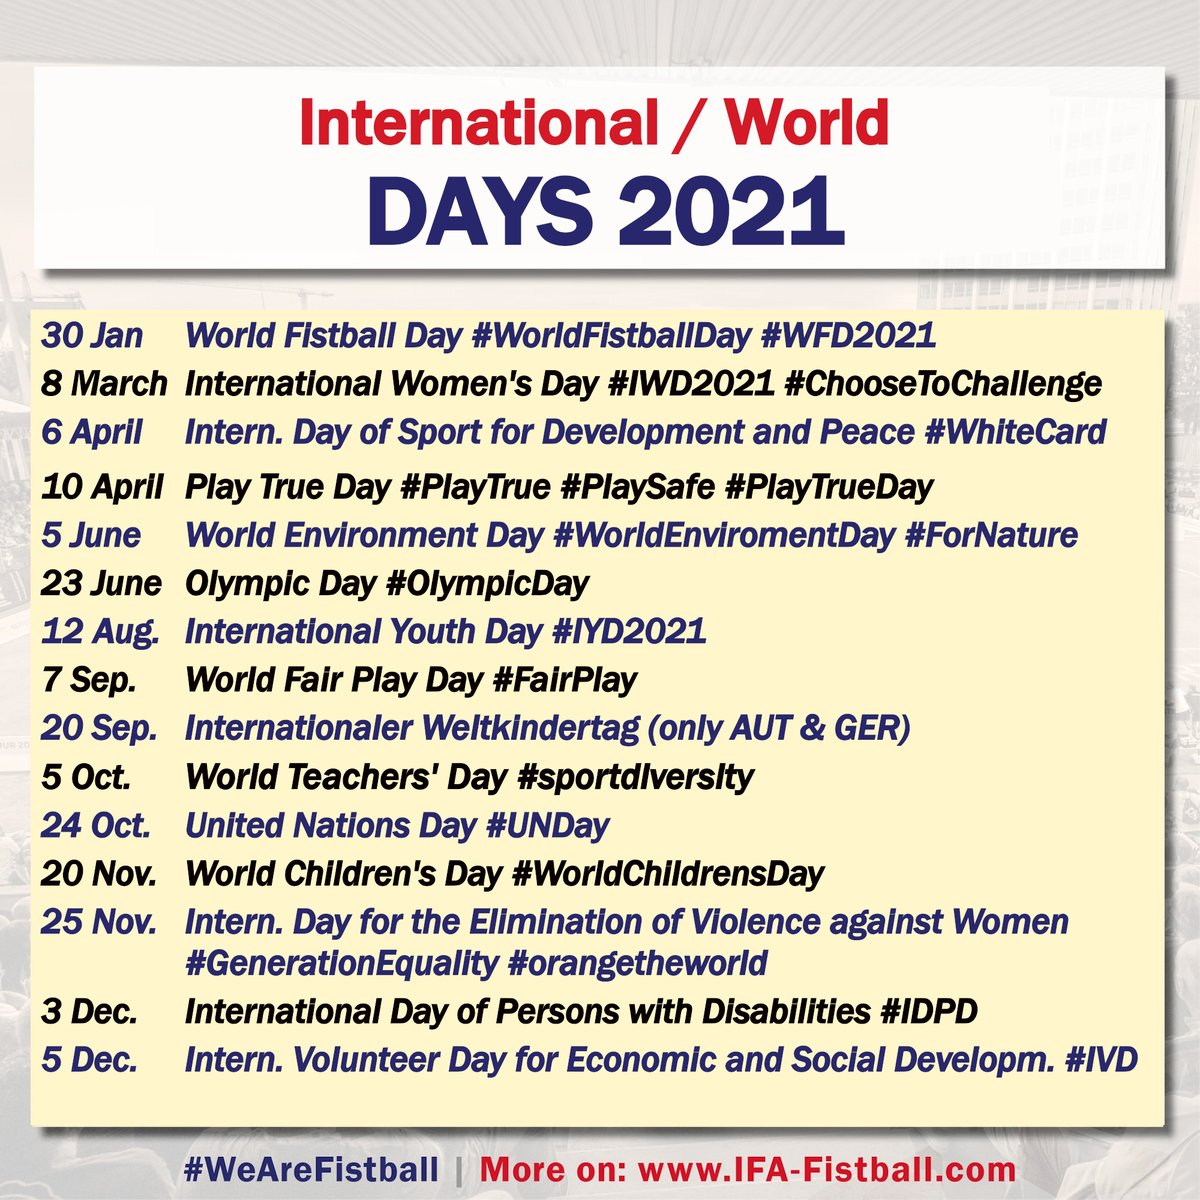 FISTBALL CELEBRATING INTERNATIONAL DAYS 2021 More:  #WorldFistballDay #WFD2021 #WeAreFistball #IWD2021 #ChooseToChallenge #IYD2021 #FairPlay #UN #WorldChildrensDay #UNDay #GenerationEquality #orangetheworld #idpd #ivd